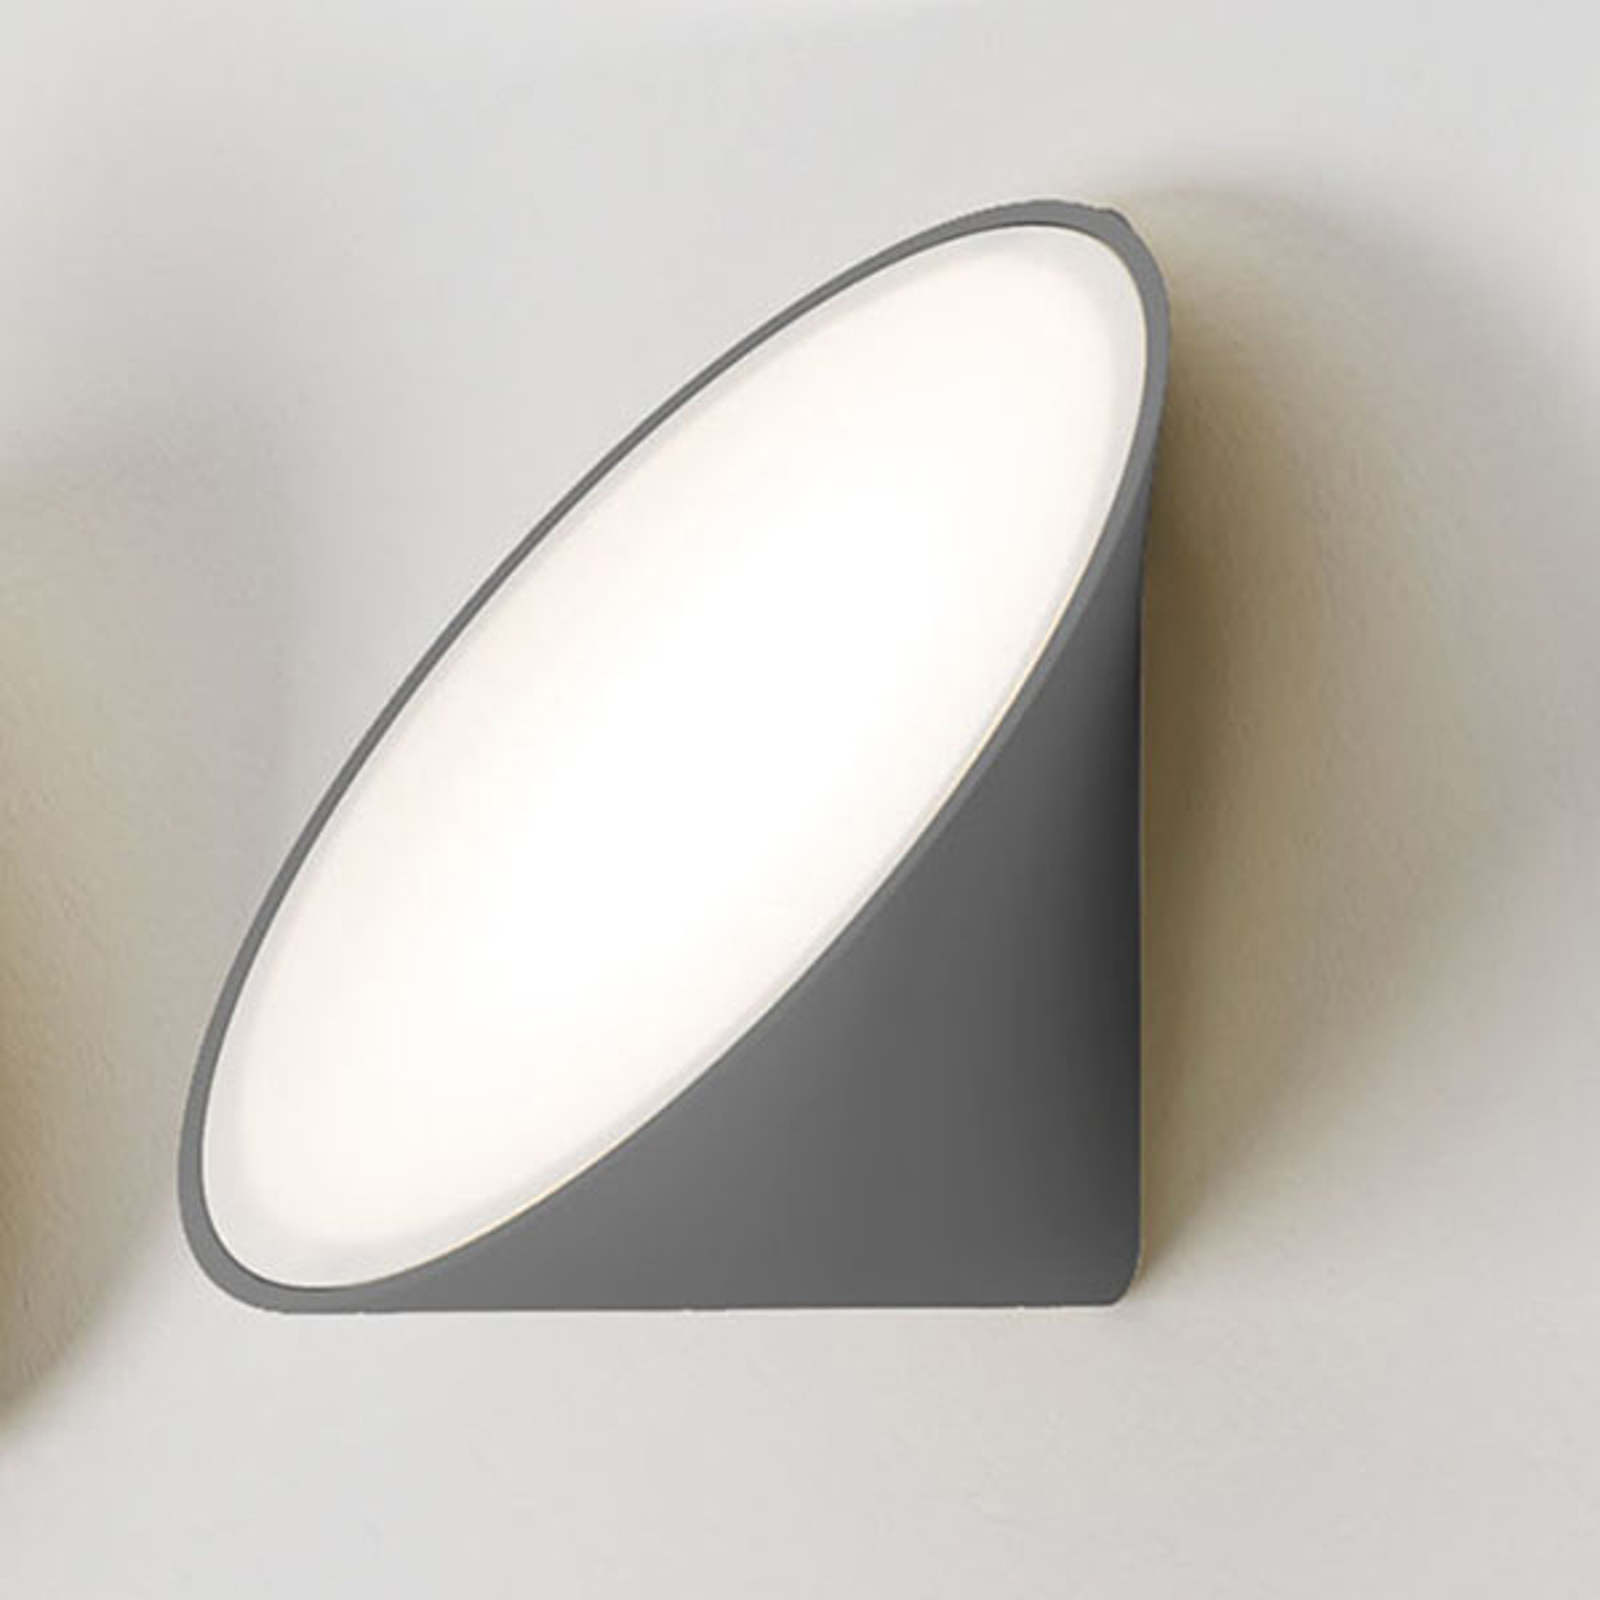 Axolight Orchid LED wandlamp, donkergrijs